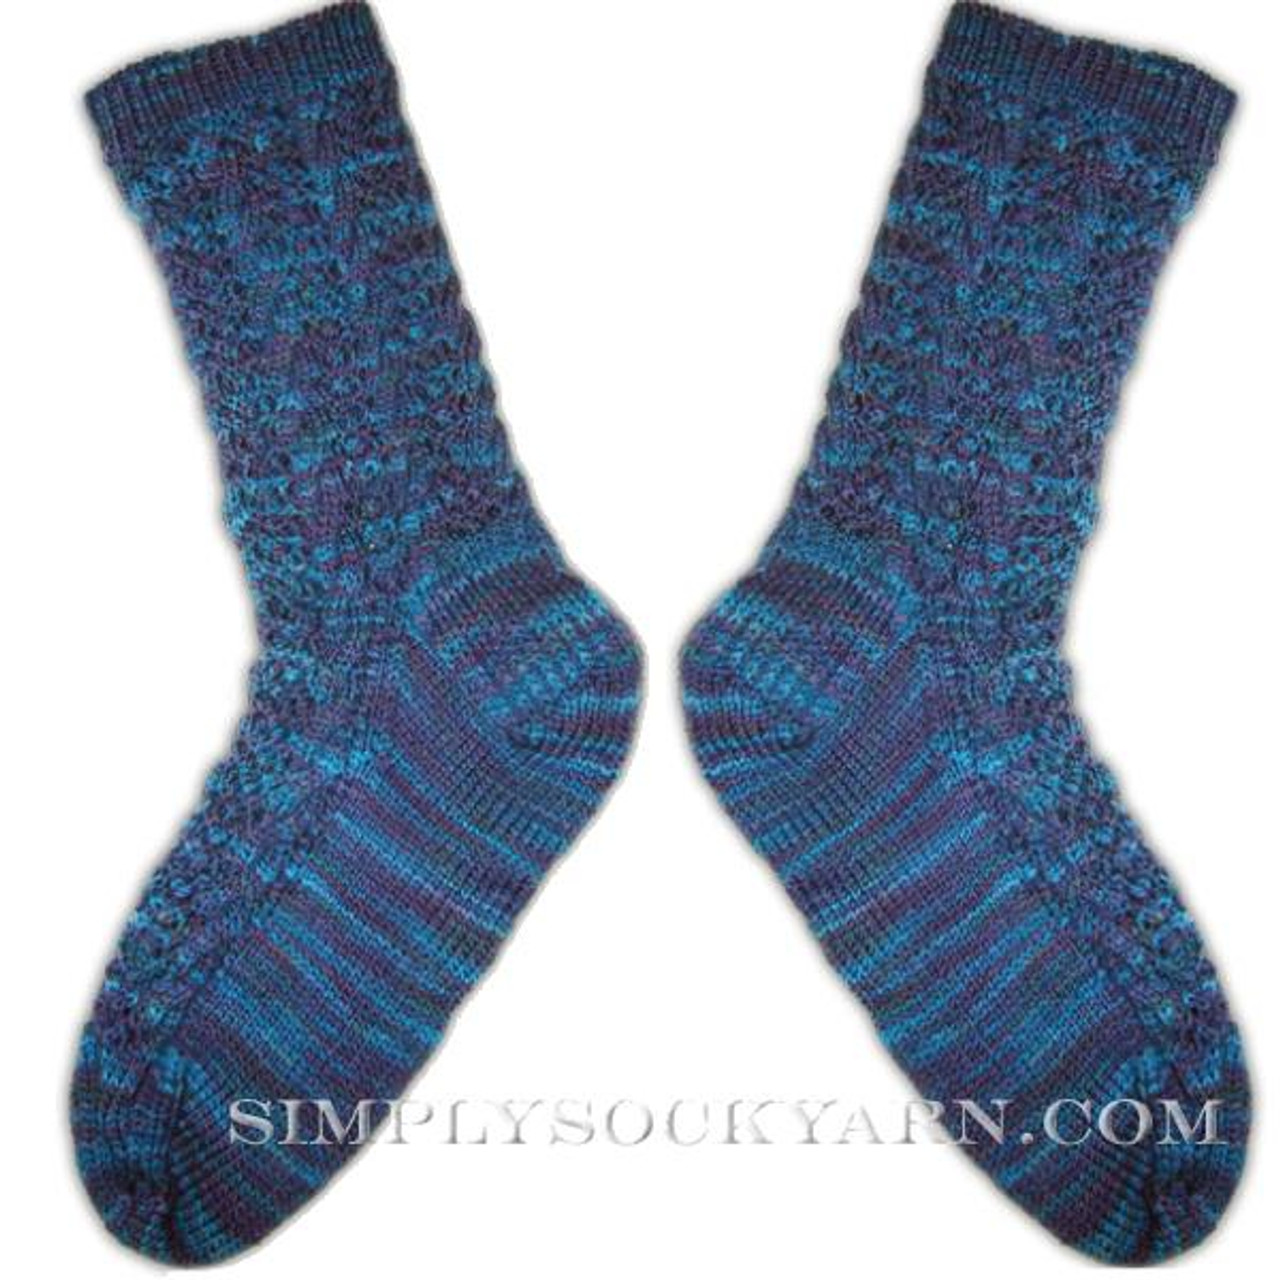 DIC Sweet Dreams Sock Pattern